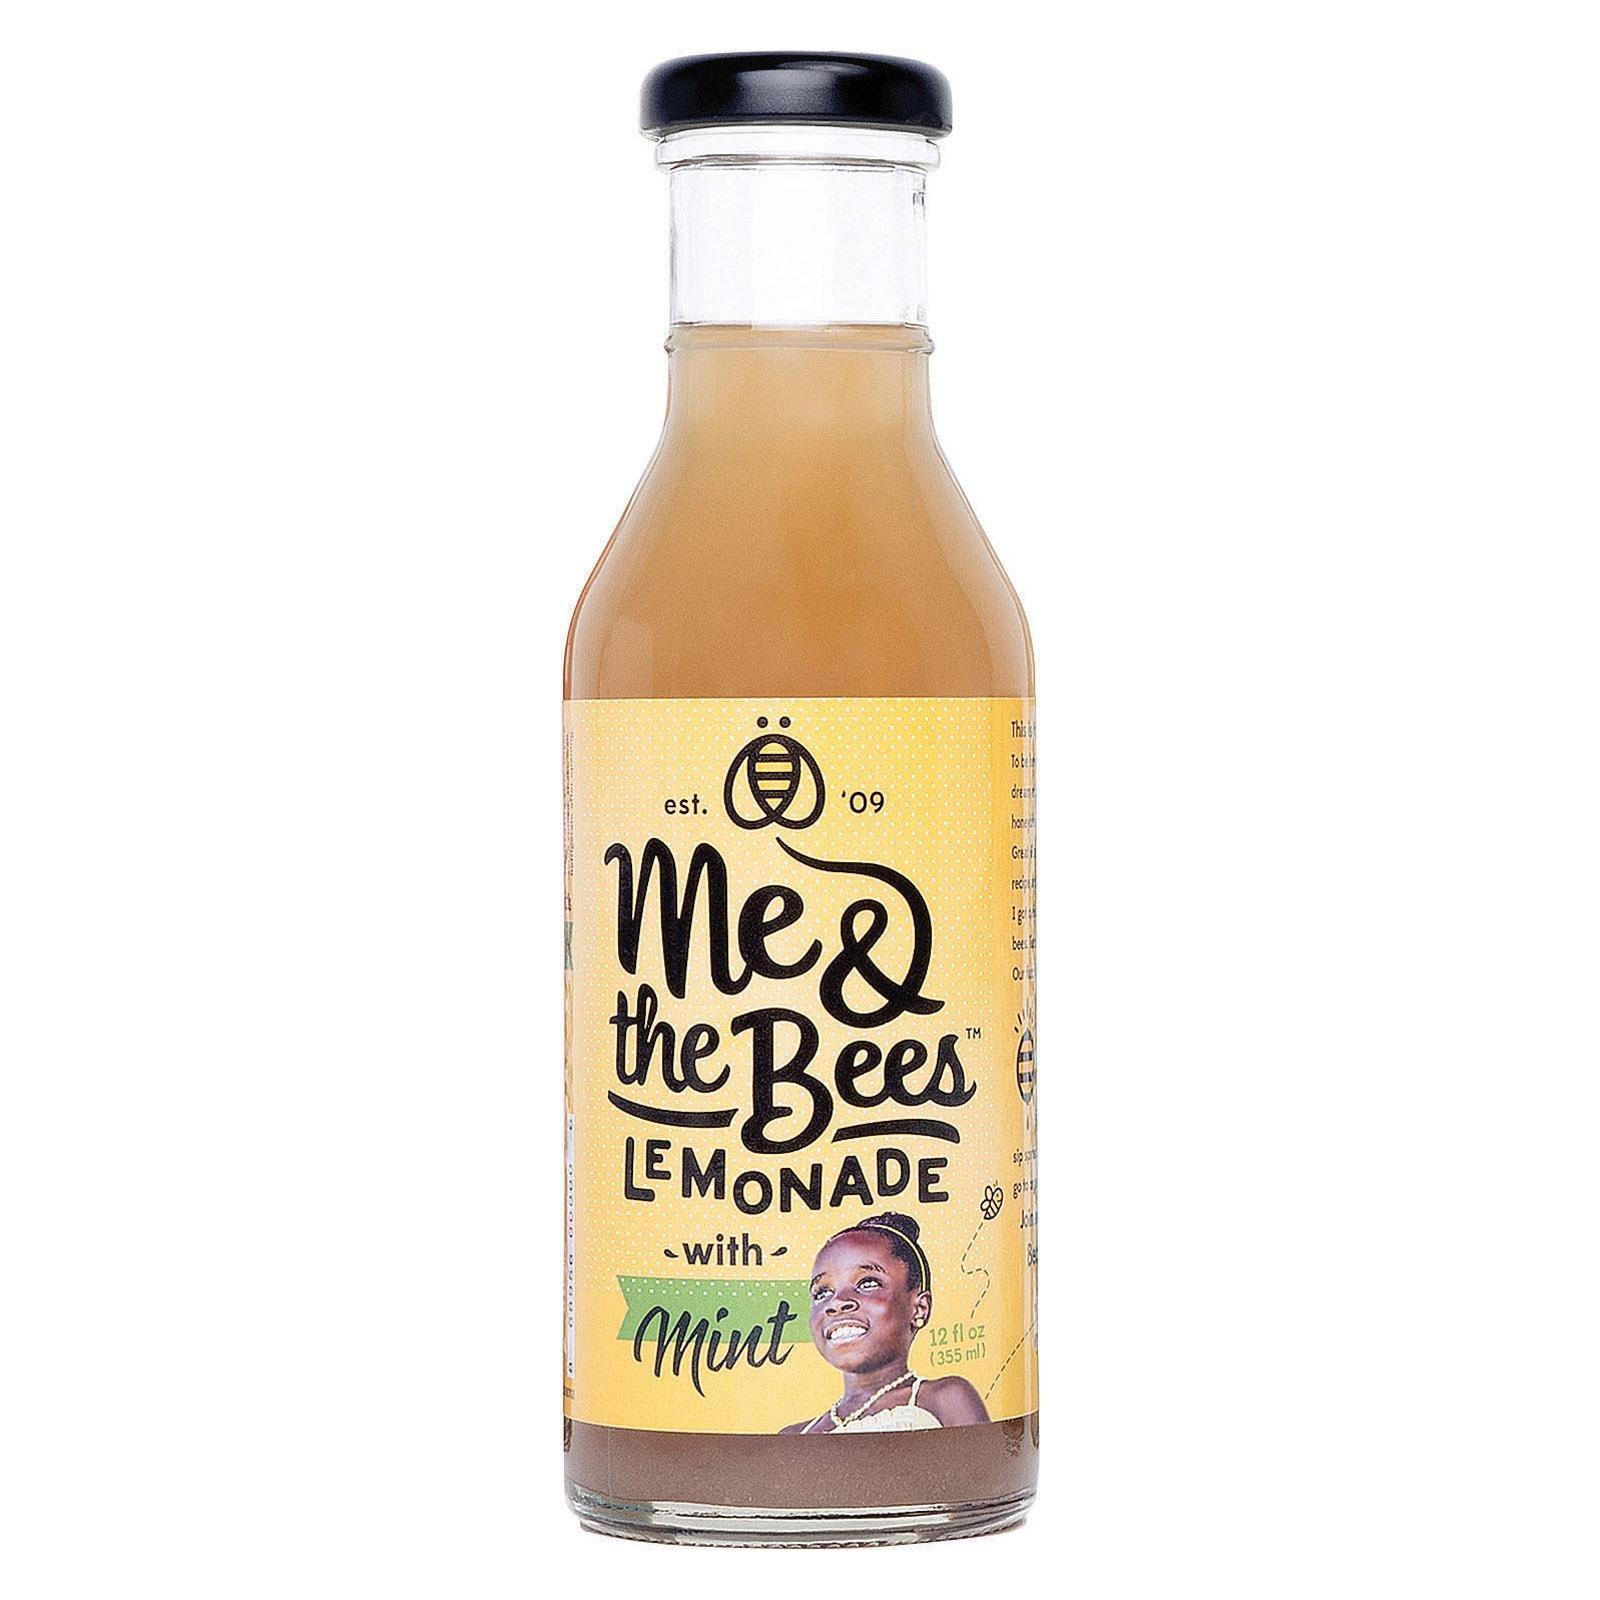 Me & The Bees, Lemonade with Mint, 12 Fl Oz